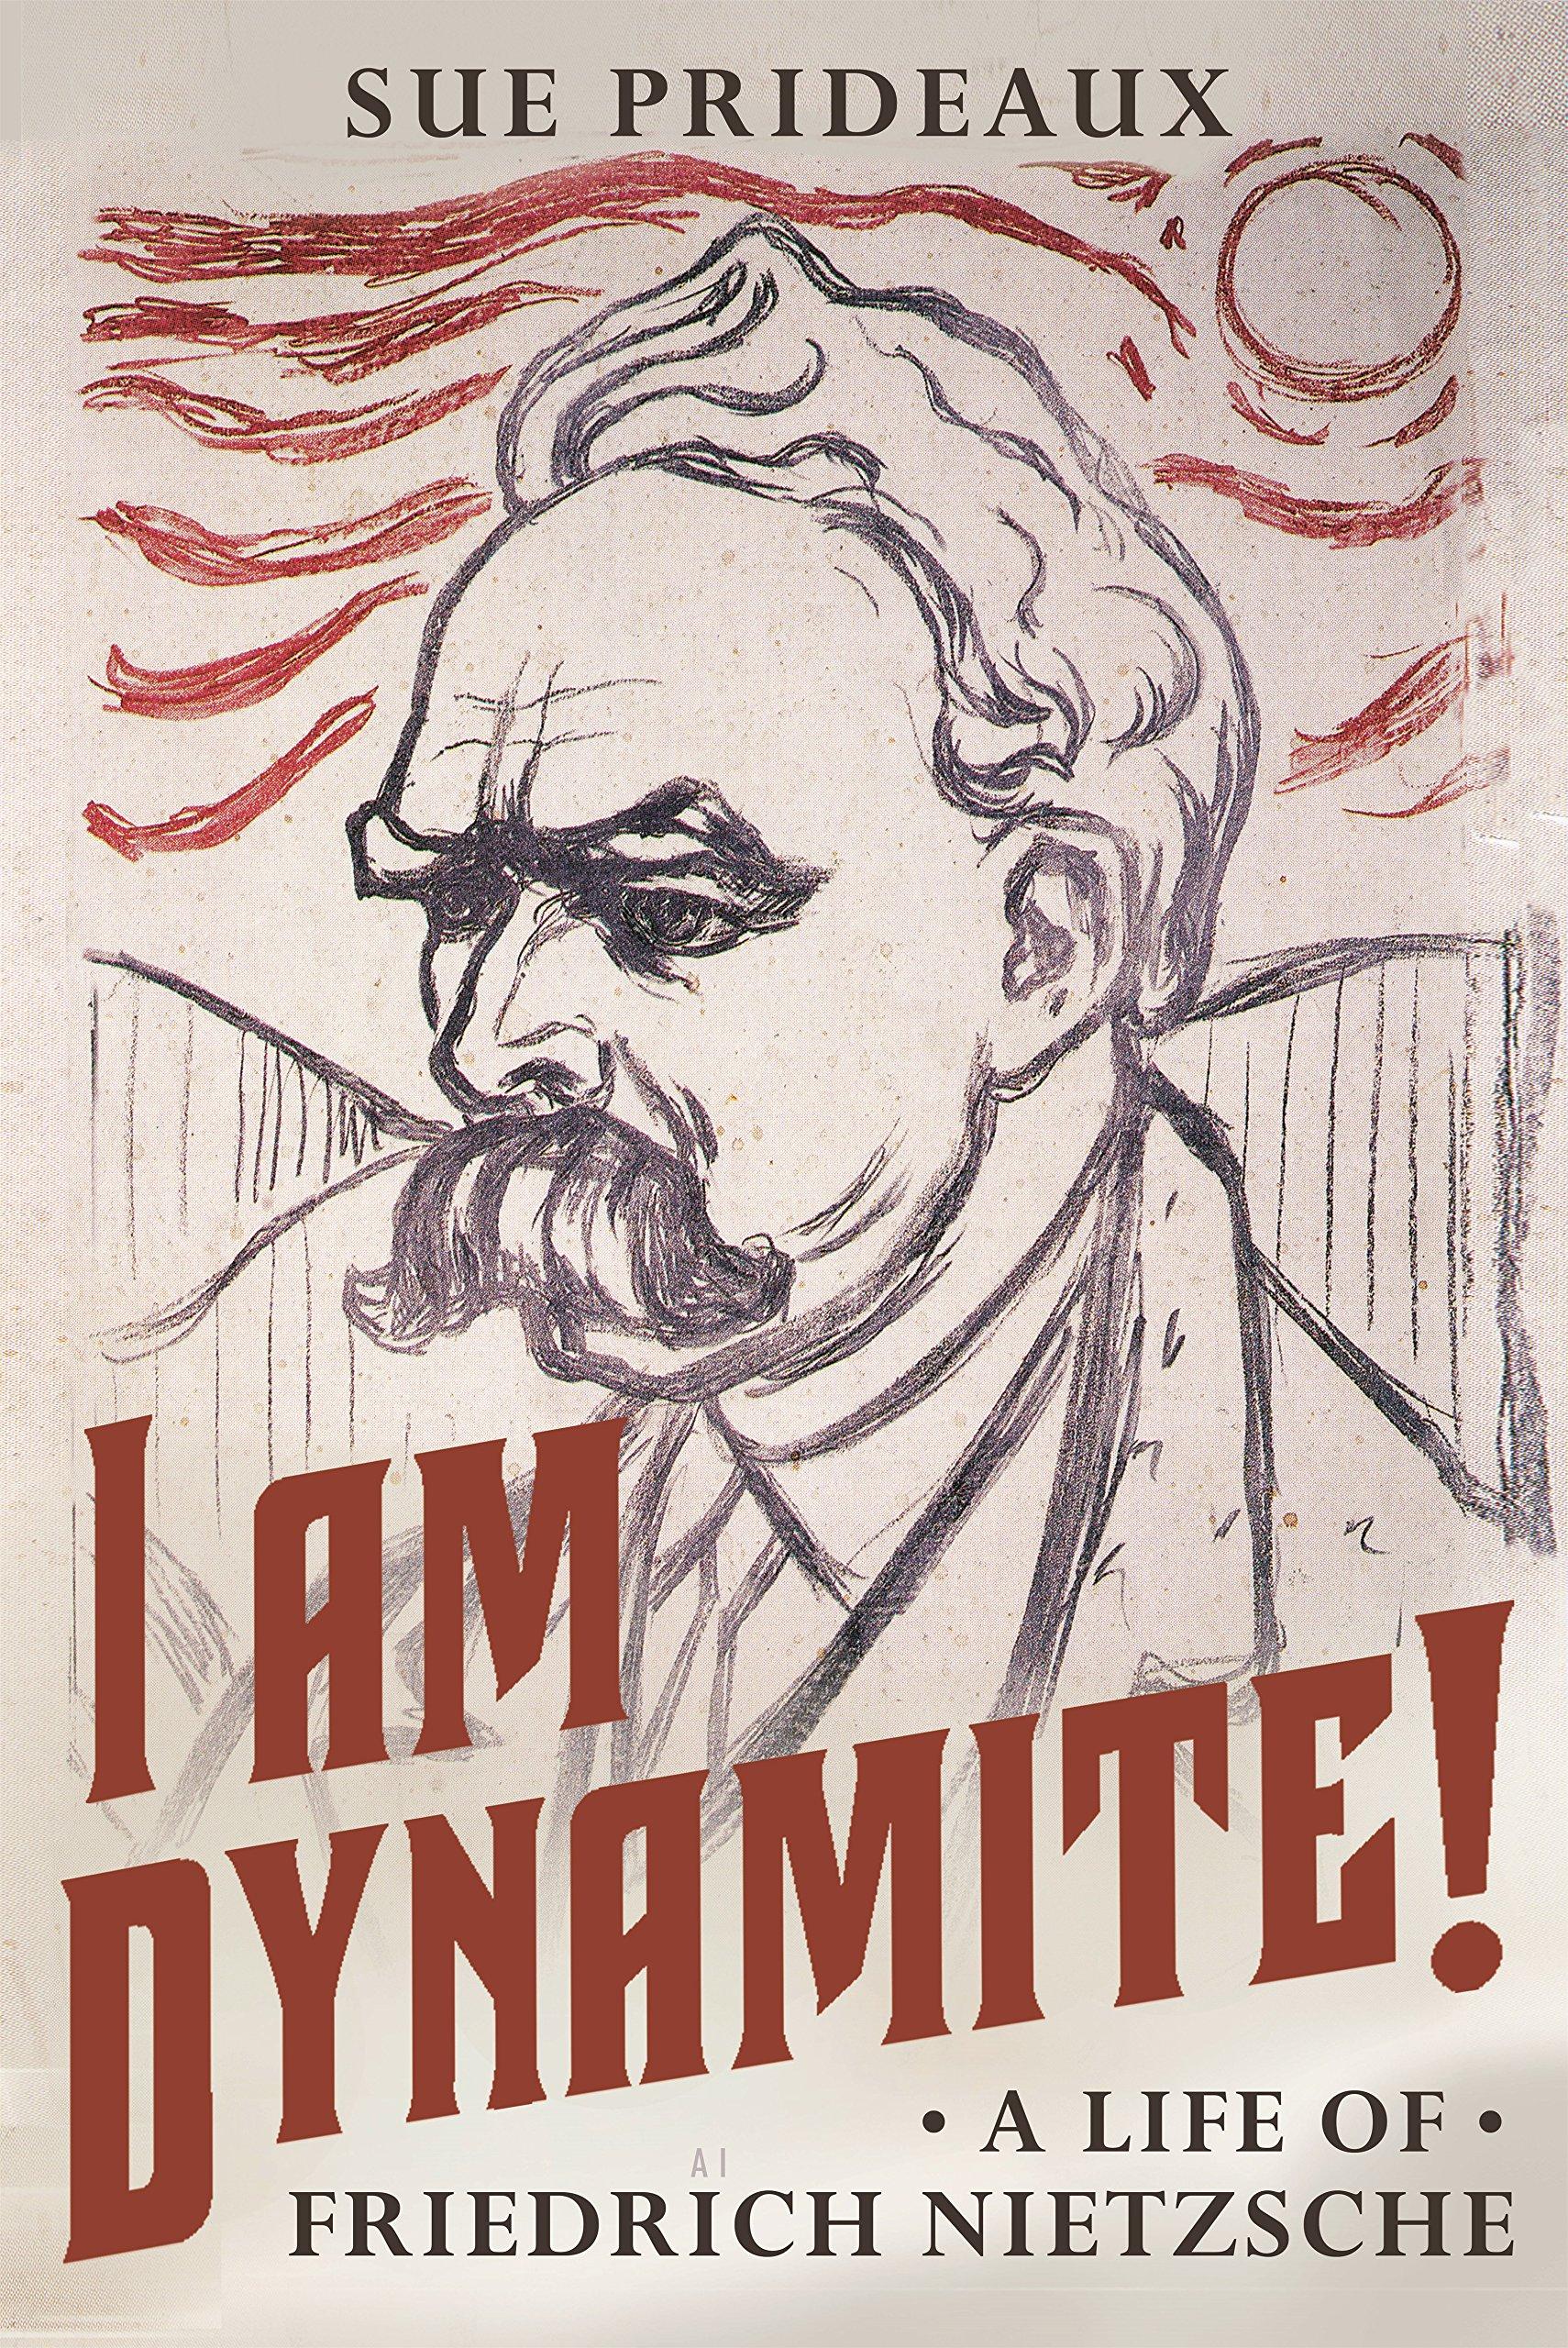 A Life of Friedrich Nietzsche: Amazon.co.uk: Sue Prideaux: 9780571336210:  Books